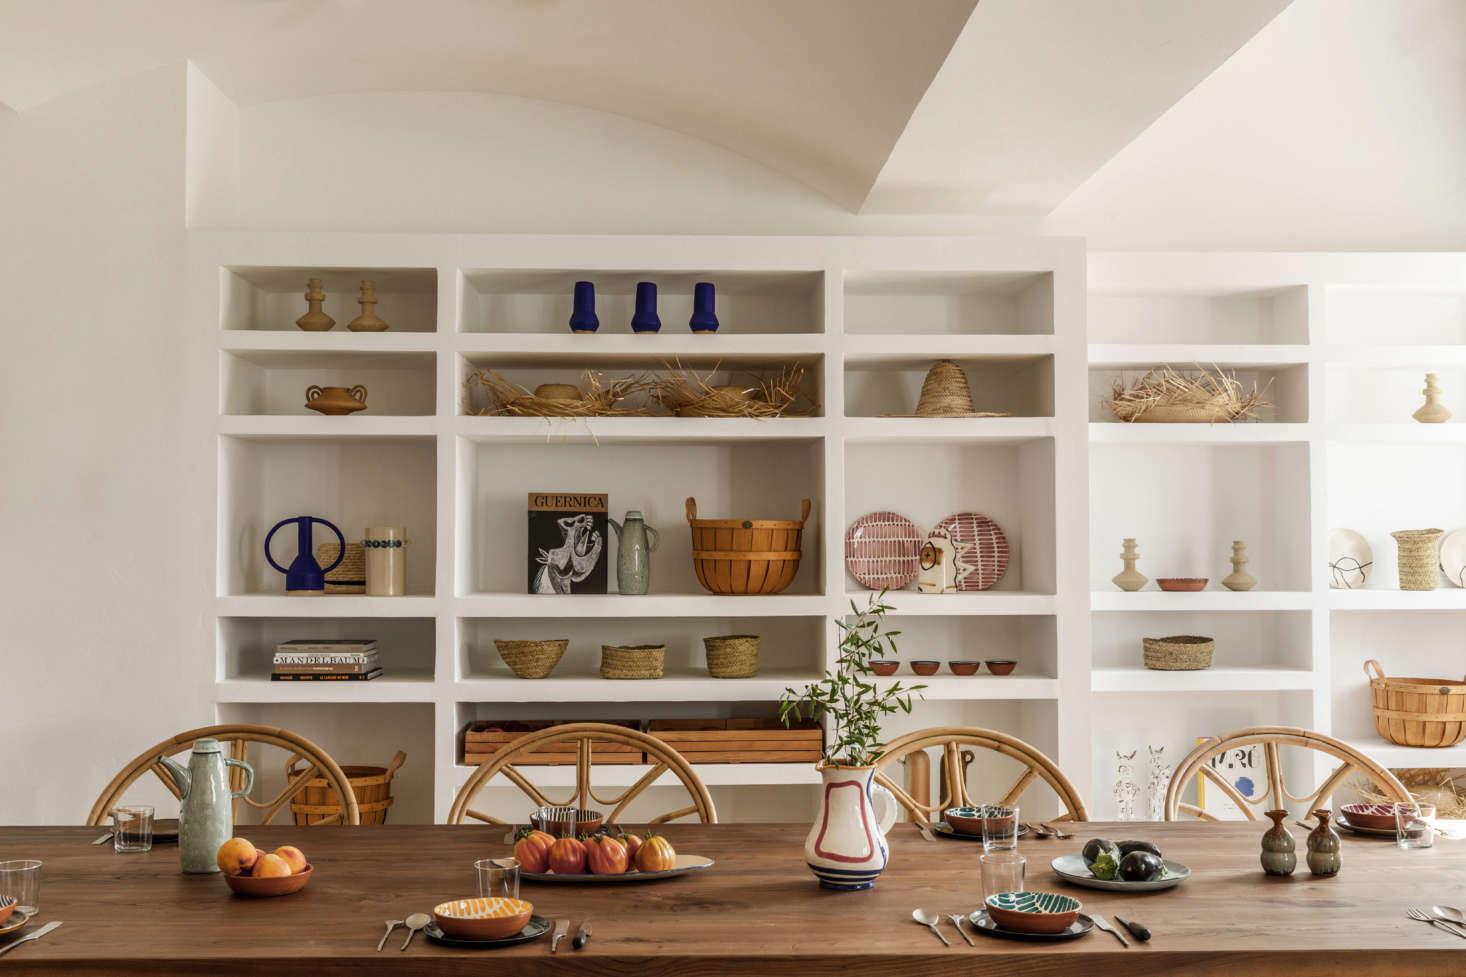 Menorca Experimental dining room, designed by Dorothee Meilichzon, Menorca, Spain. Karel Balas photo.